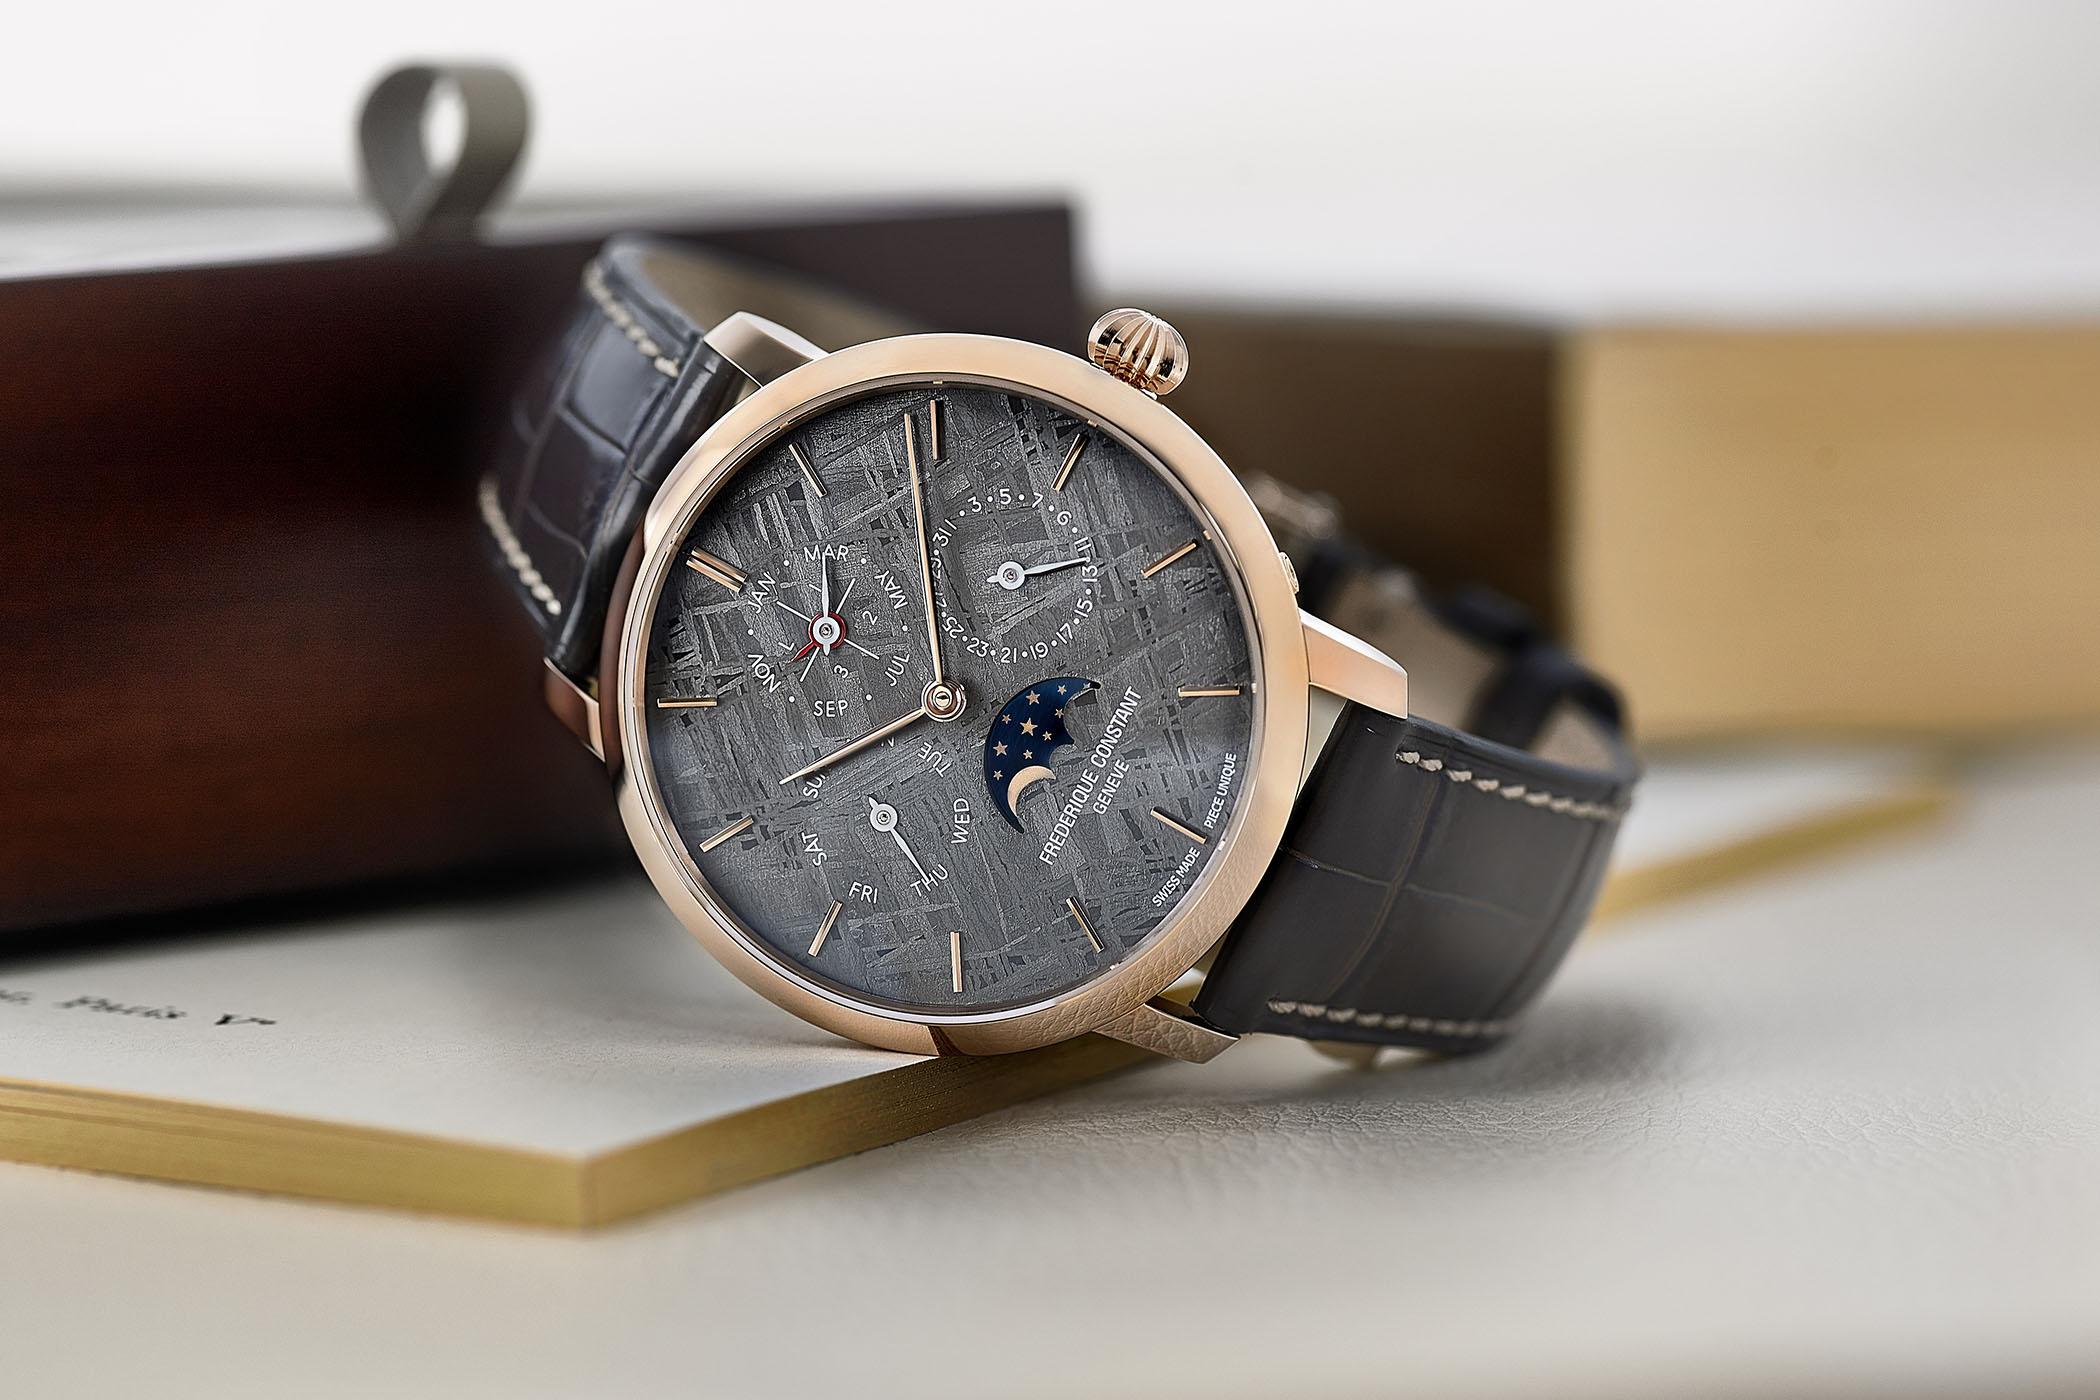 Frederique Constant Manufacture Perpetual Calendar Unique Meteorite Dial Only Watch 2017